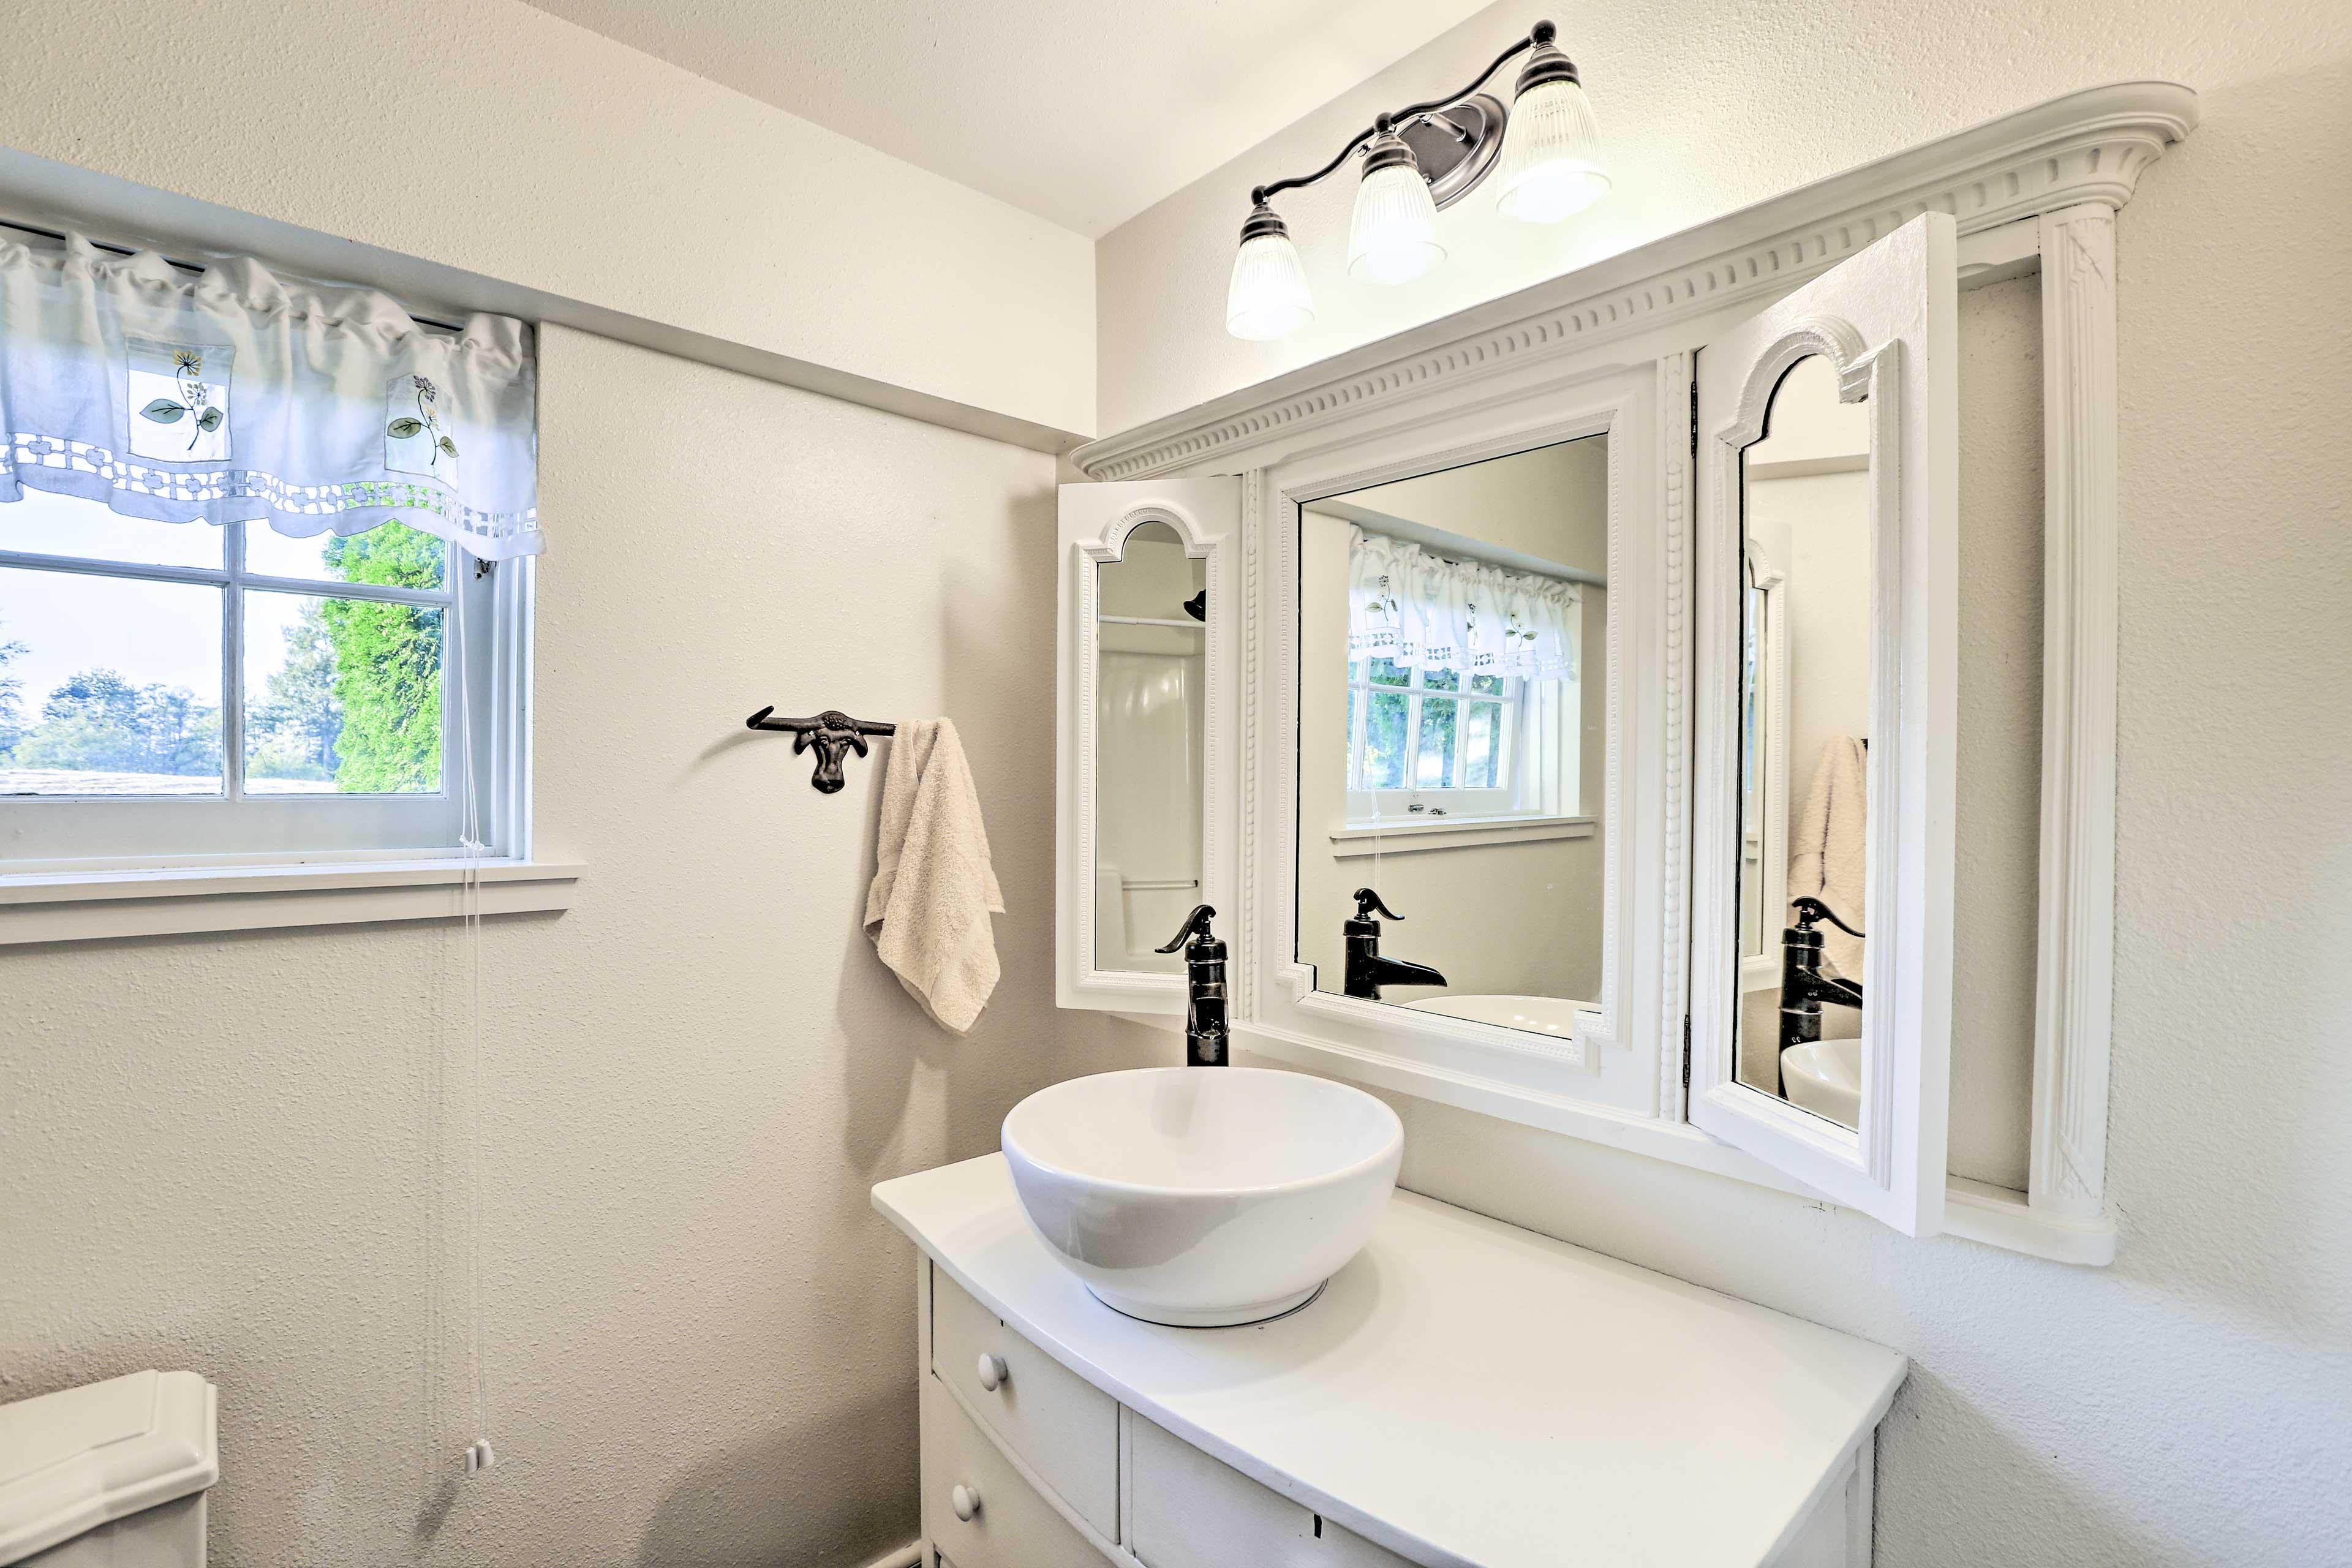 Prep for the day in the pristine full bathroom.